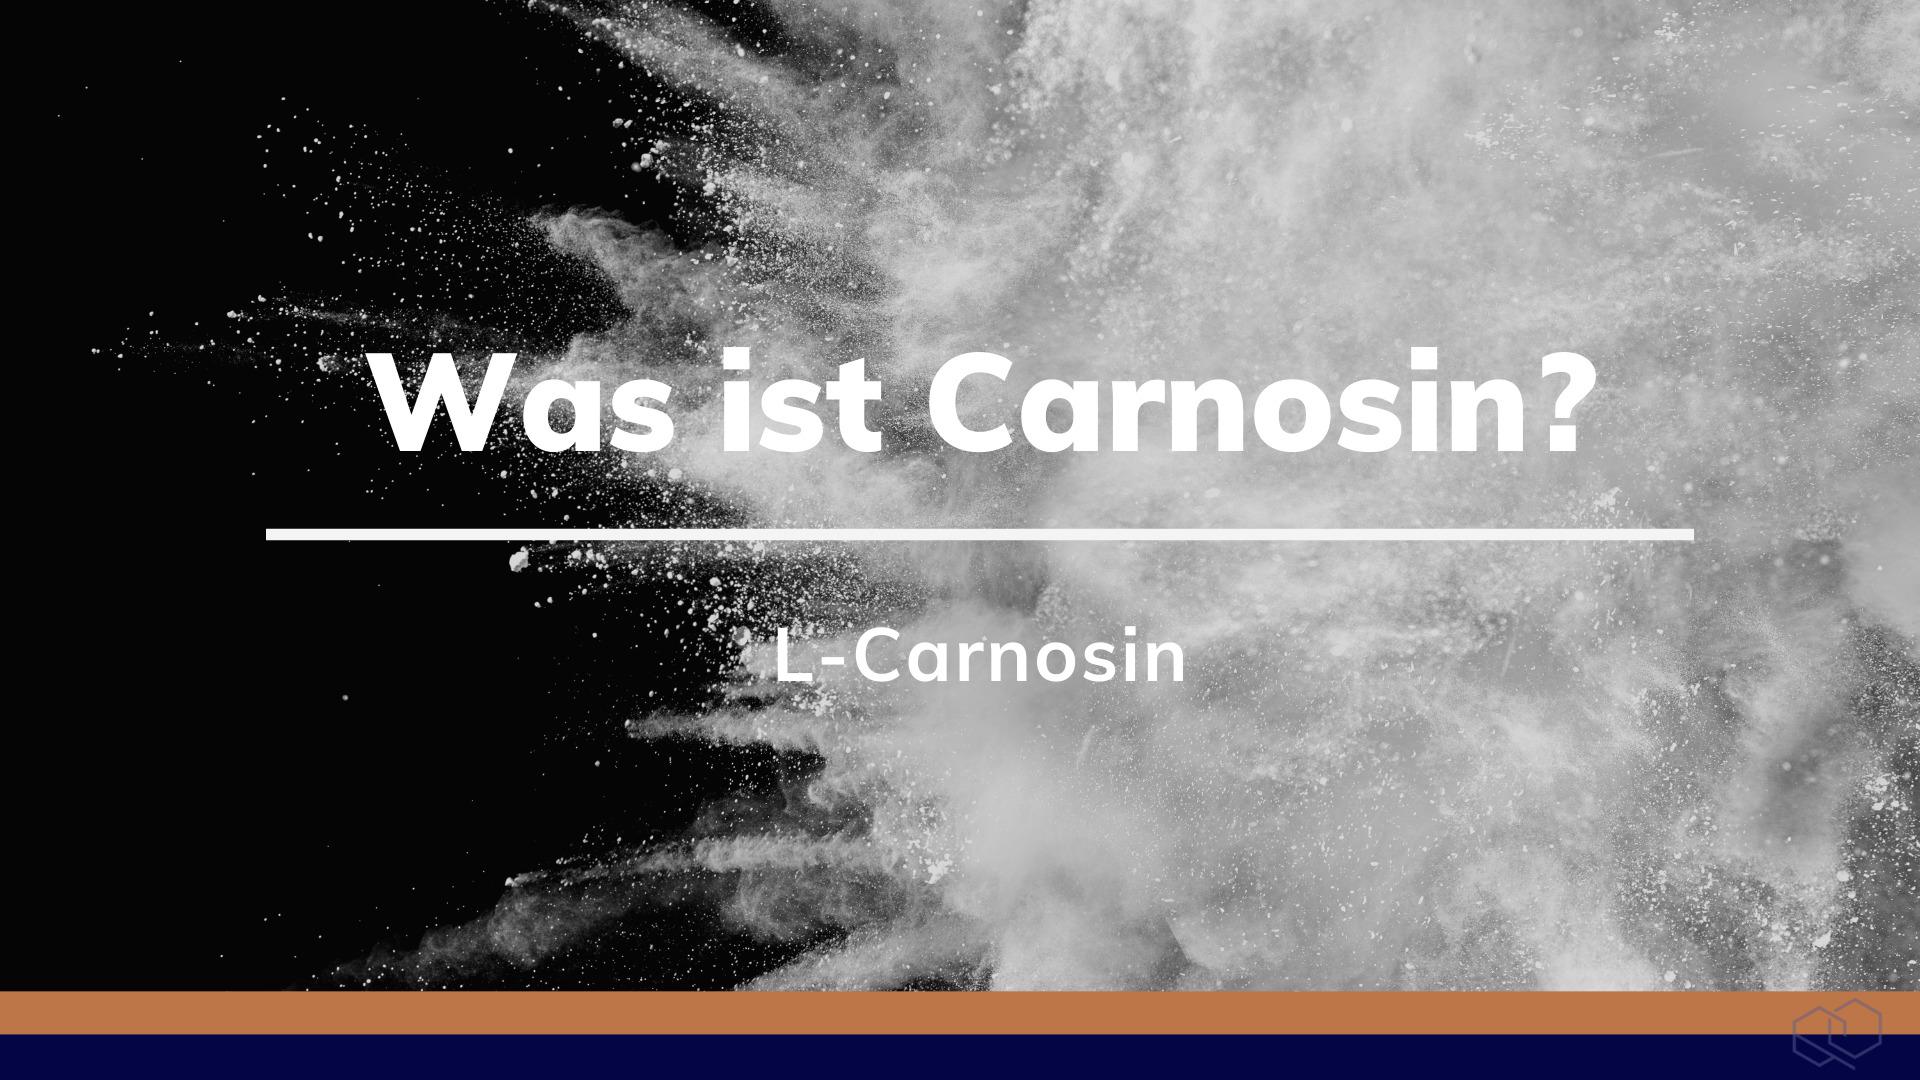 Was ist Carnosin?